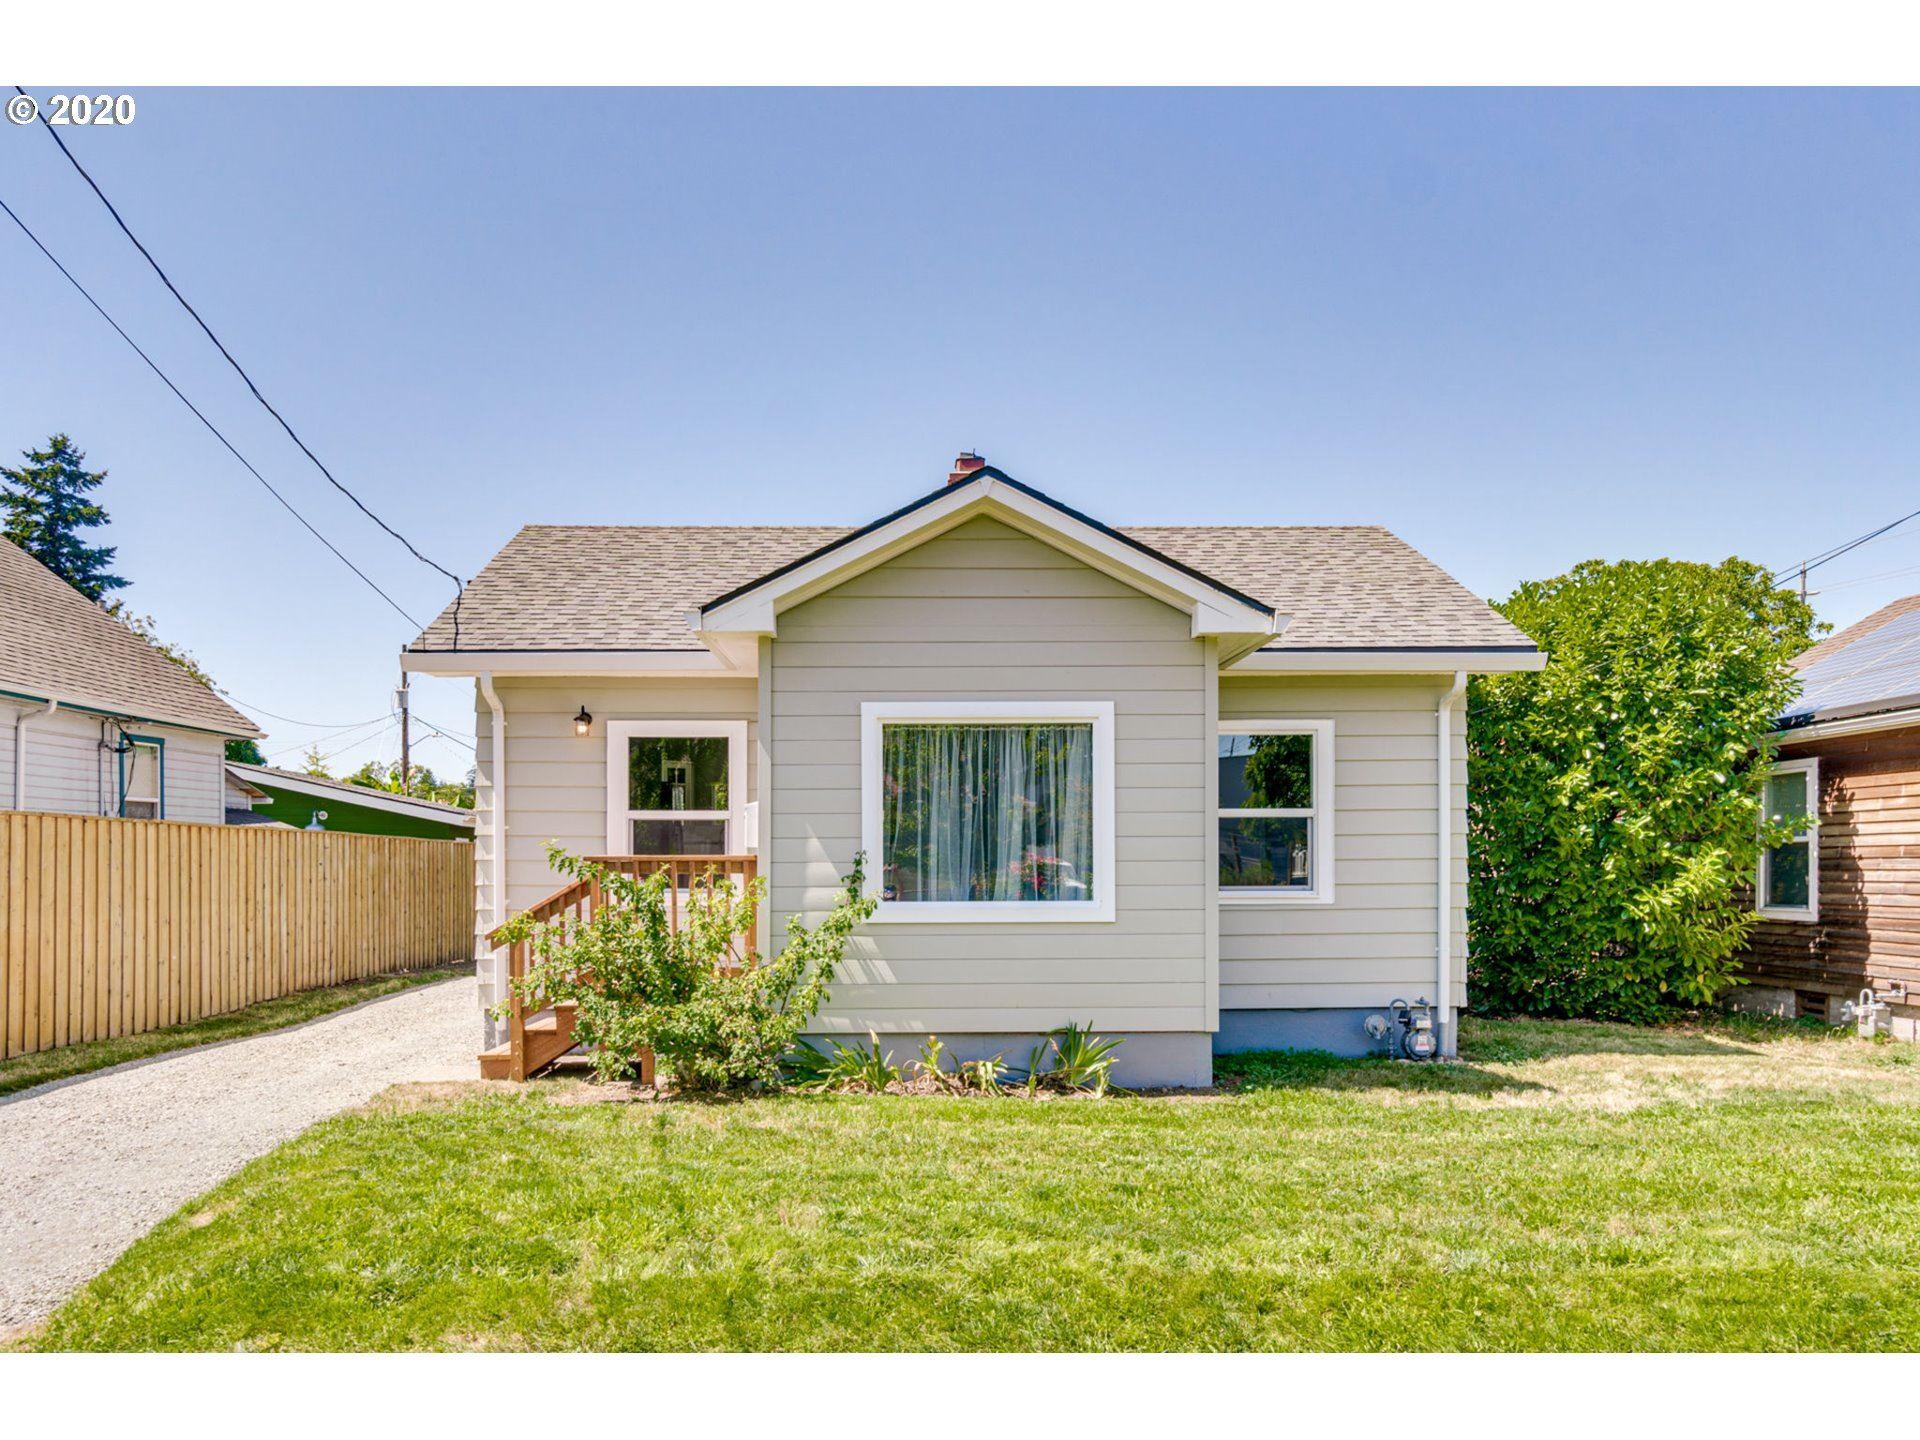 1405 NE 63RD AVE, Portland, OR 97213 - MLS#: 20329909